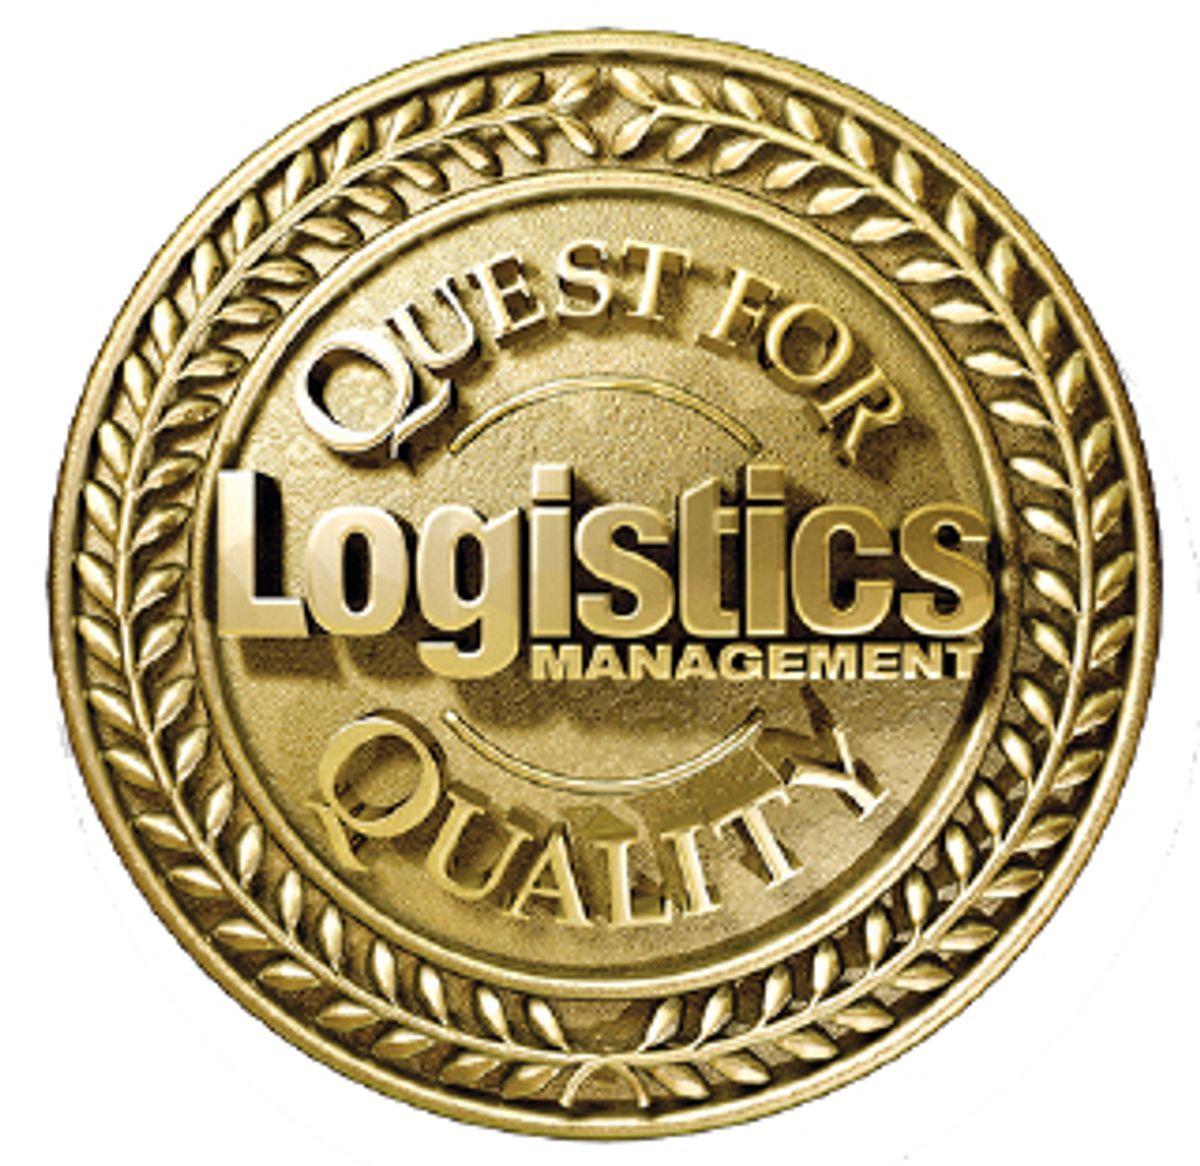 Penske Logistics is Repeat Quest for Quality Award Winner